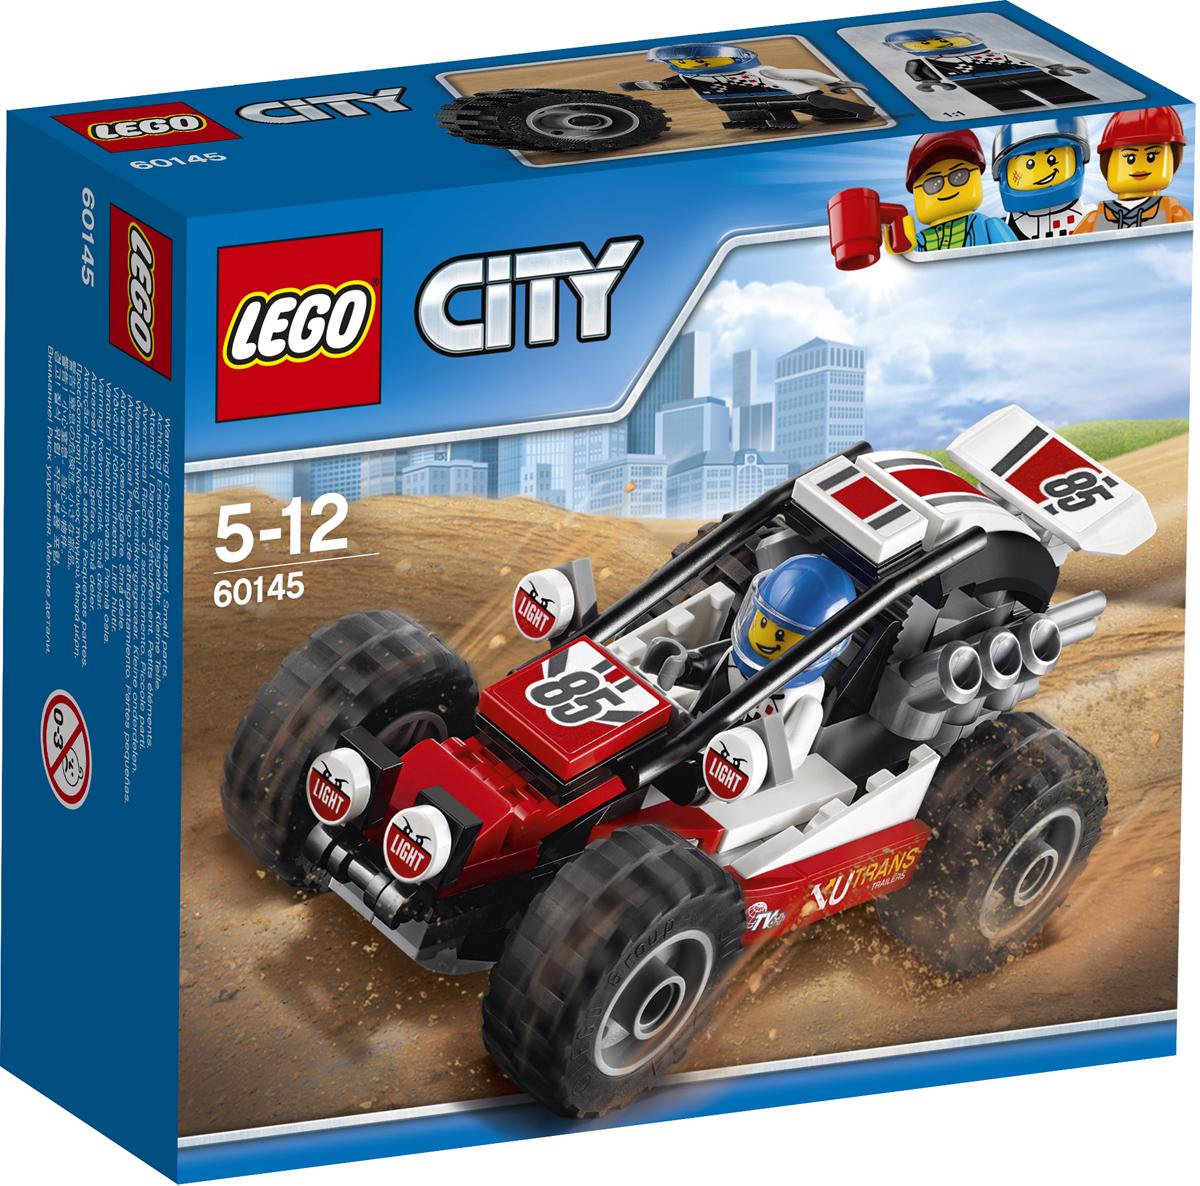 LEGO City Конструктор Багги 60145 lego city конструктор внедорожник каскадера 60146